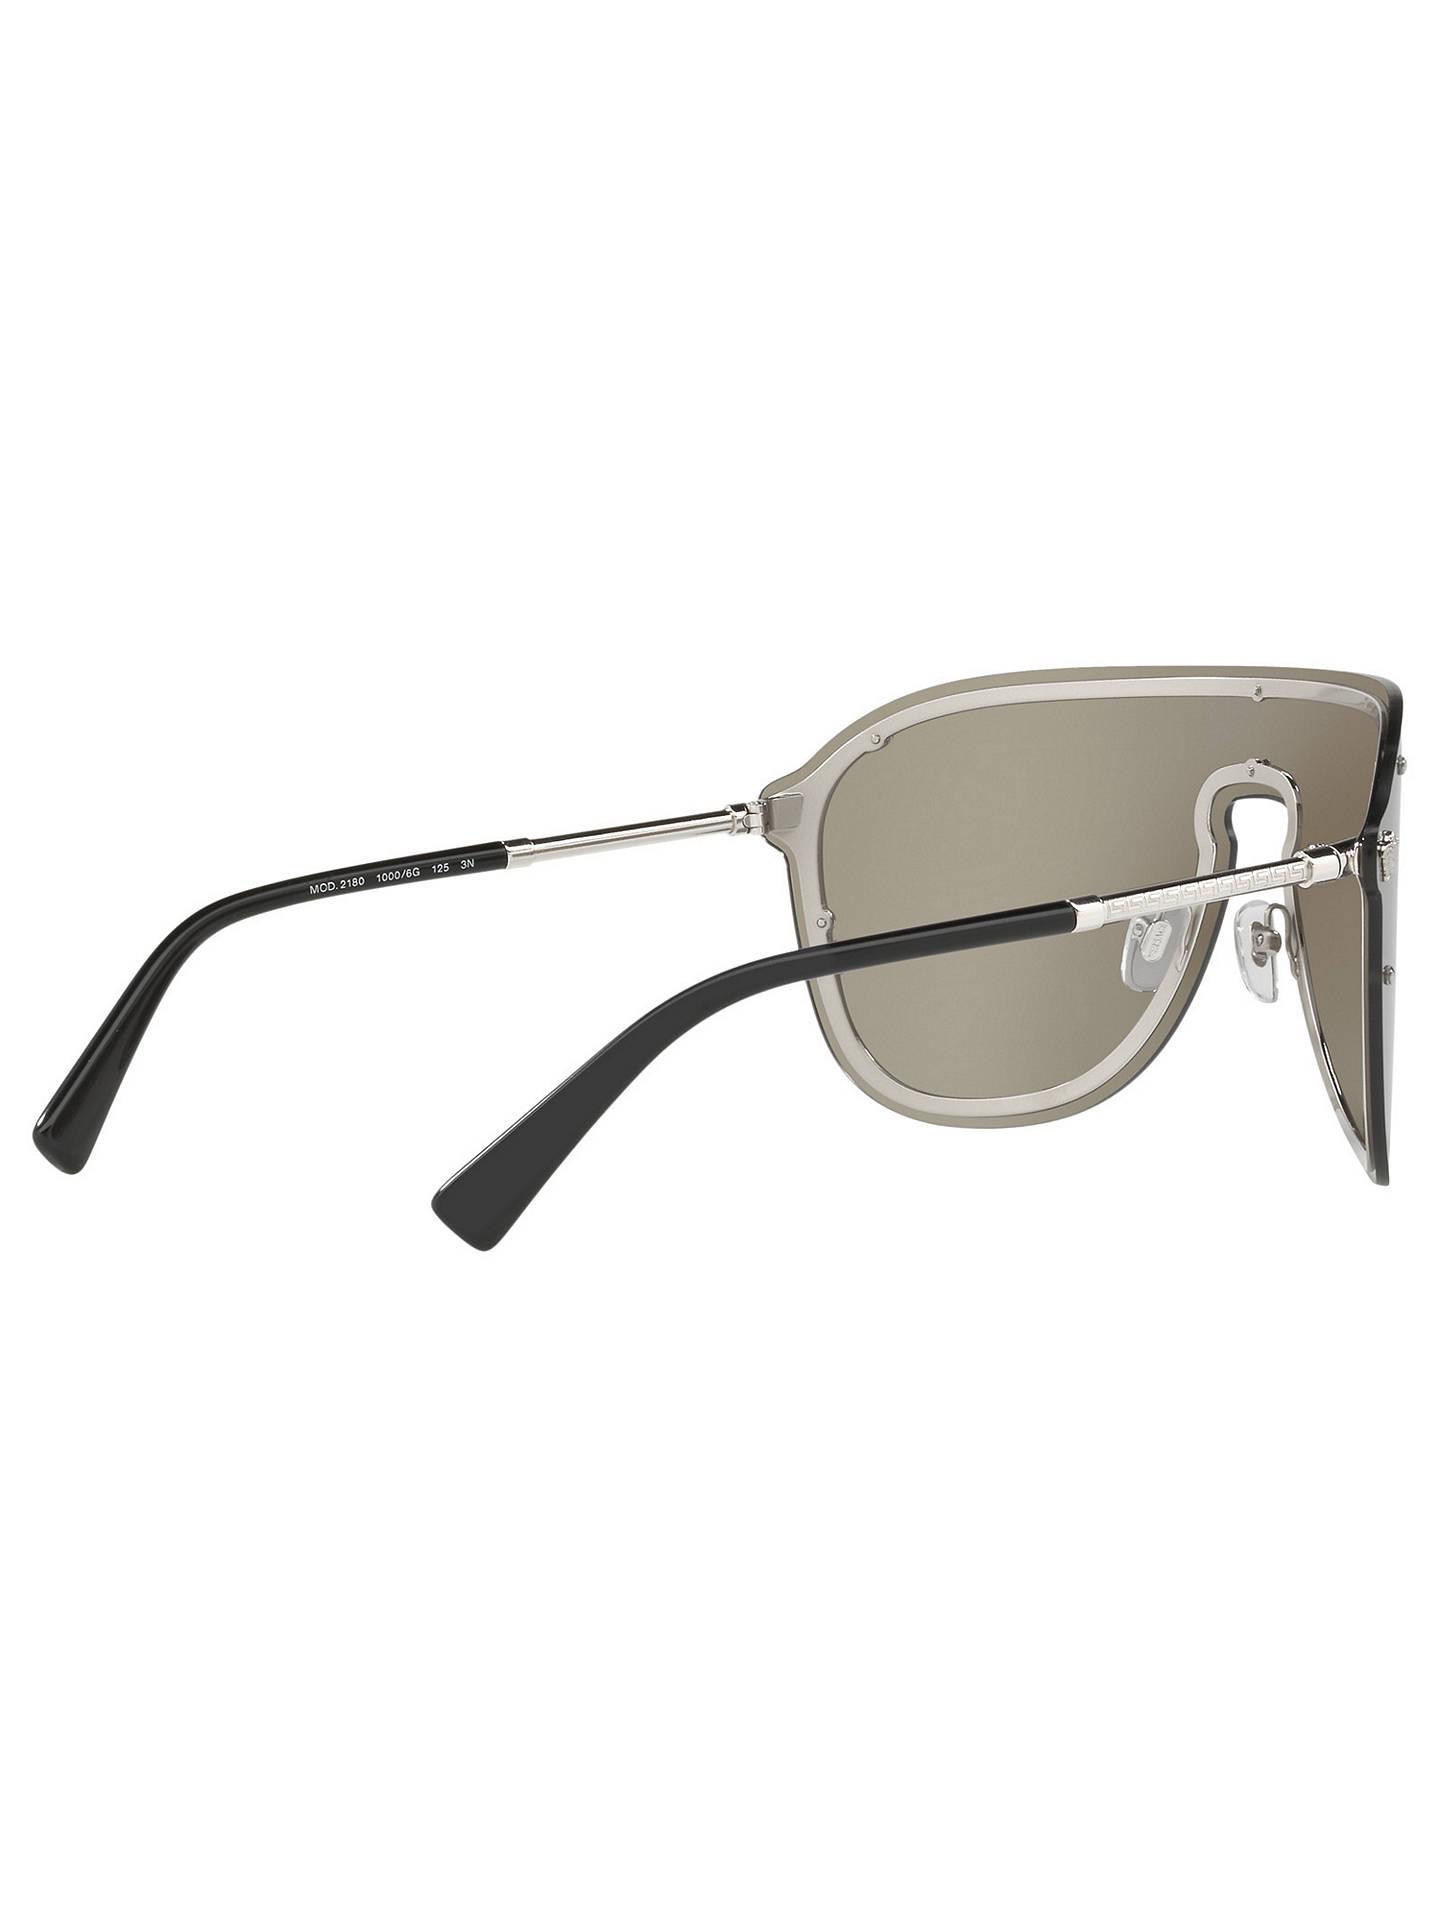 922e67d45d011 Versace VE2180 Women s Aviator Sunglasses at John Lewis   Partners